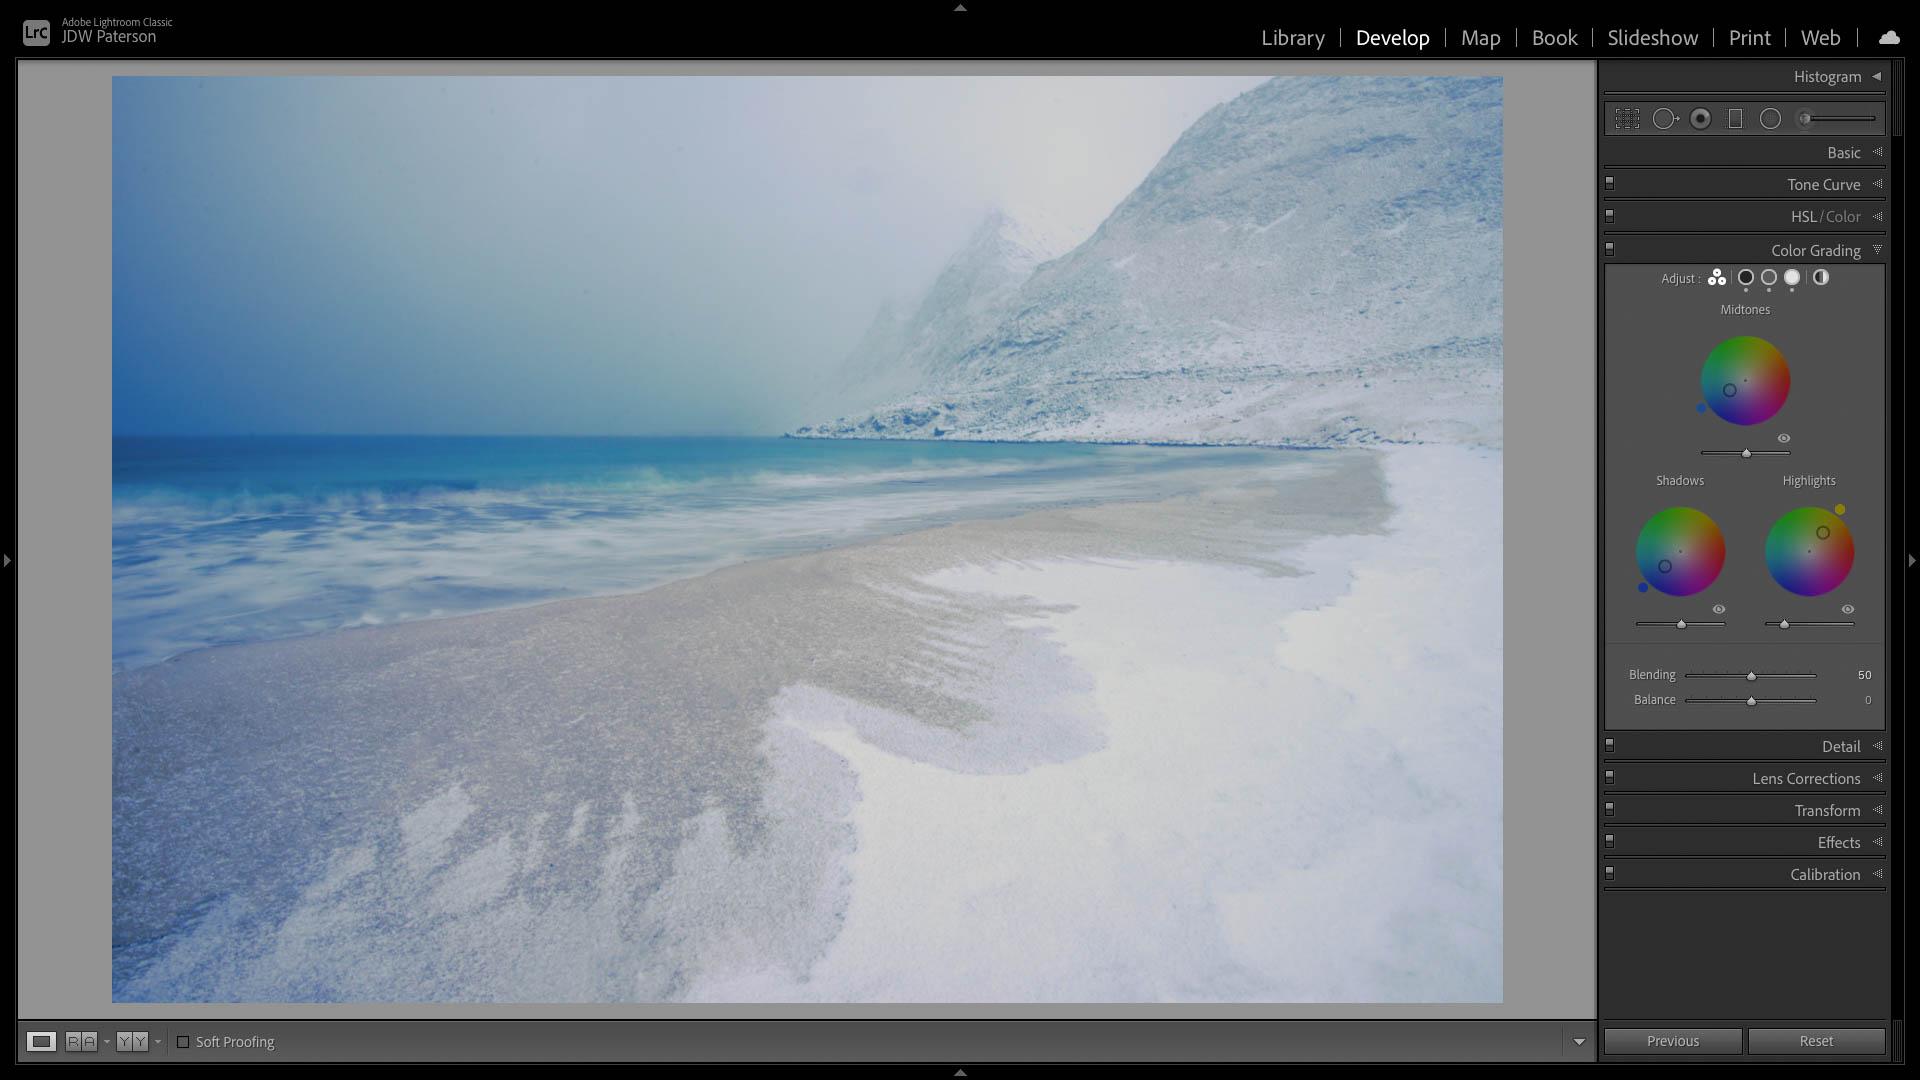 Screenshot showing the color grading panel in Lightroom